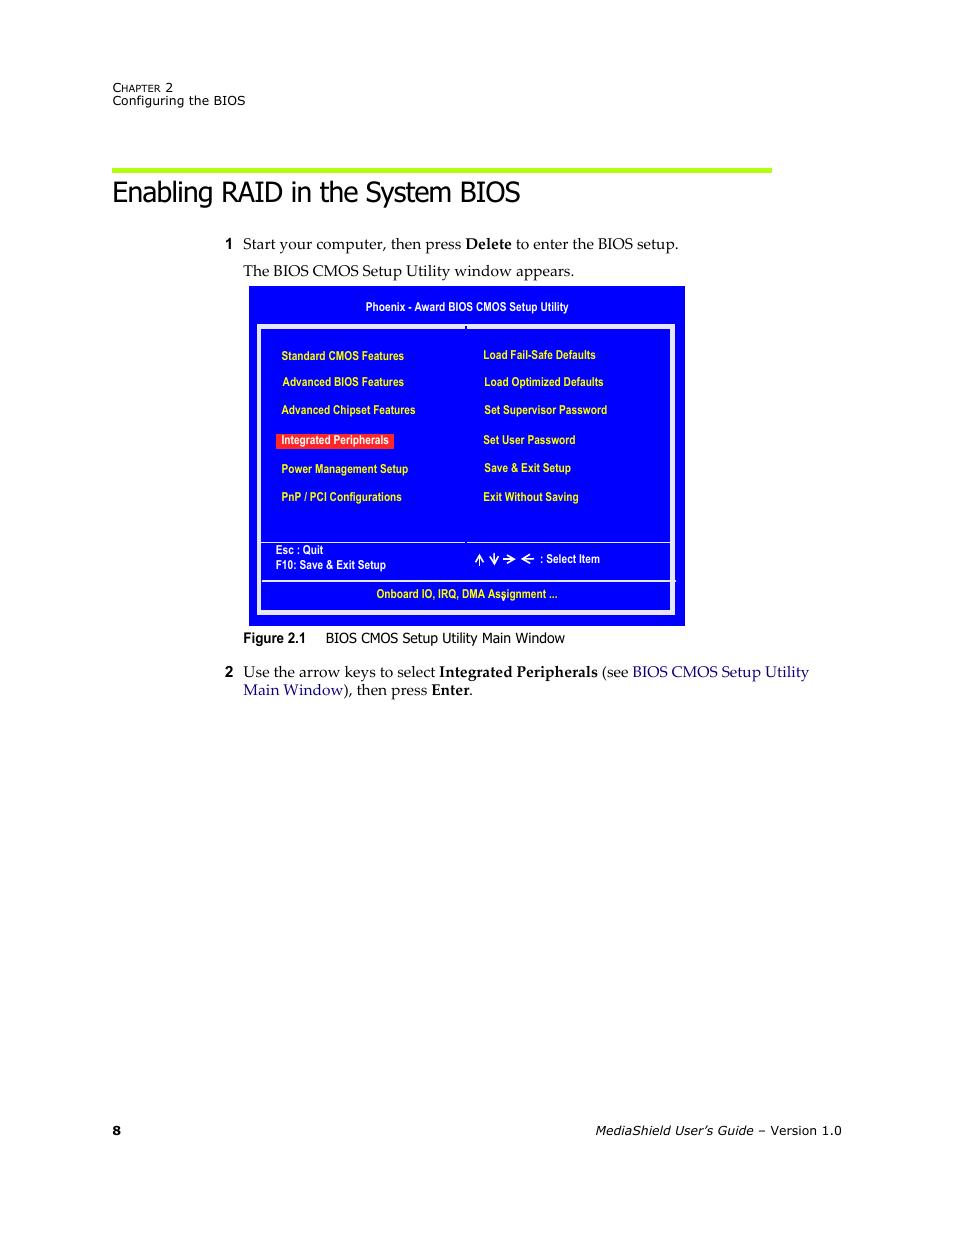 Enabling raid in the system bios | HP ProLiant ML115 Server User